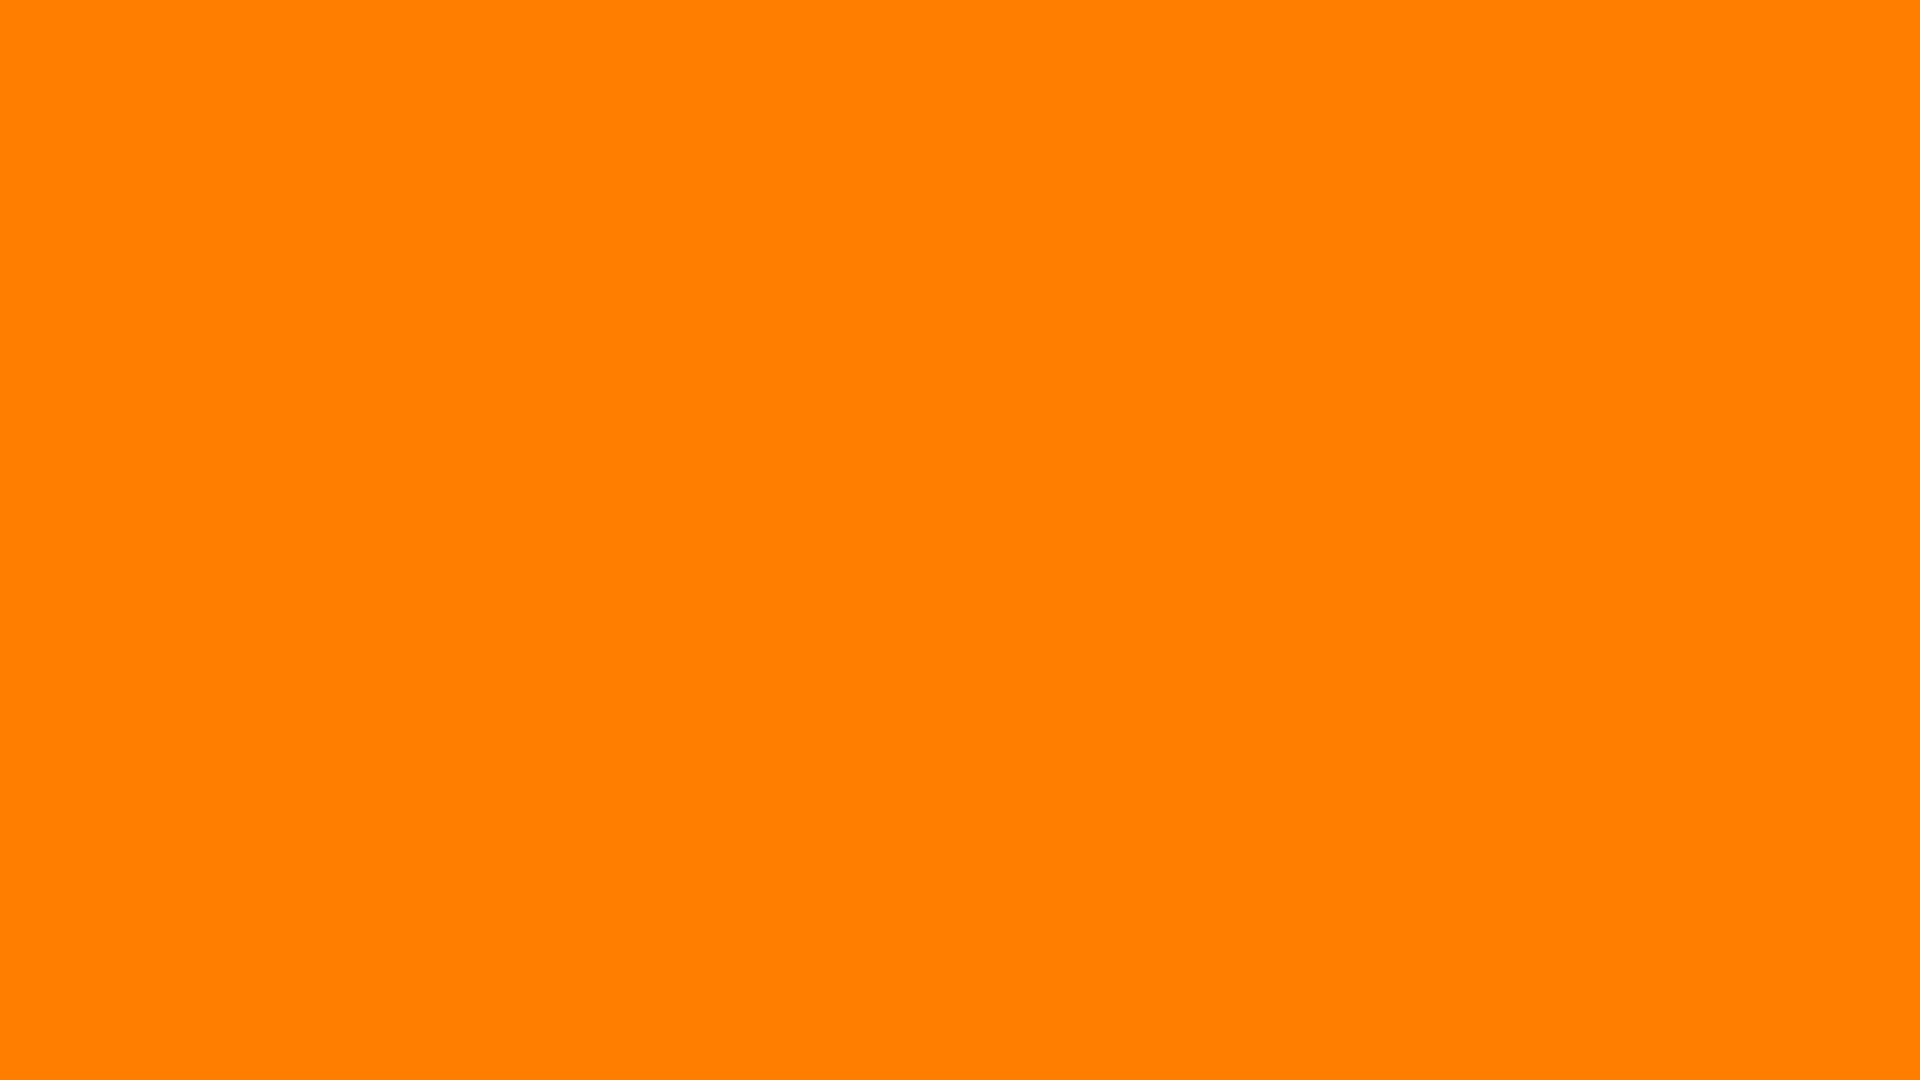 1920x1080 amber orange solid